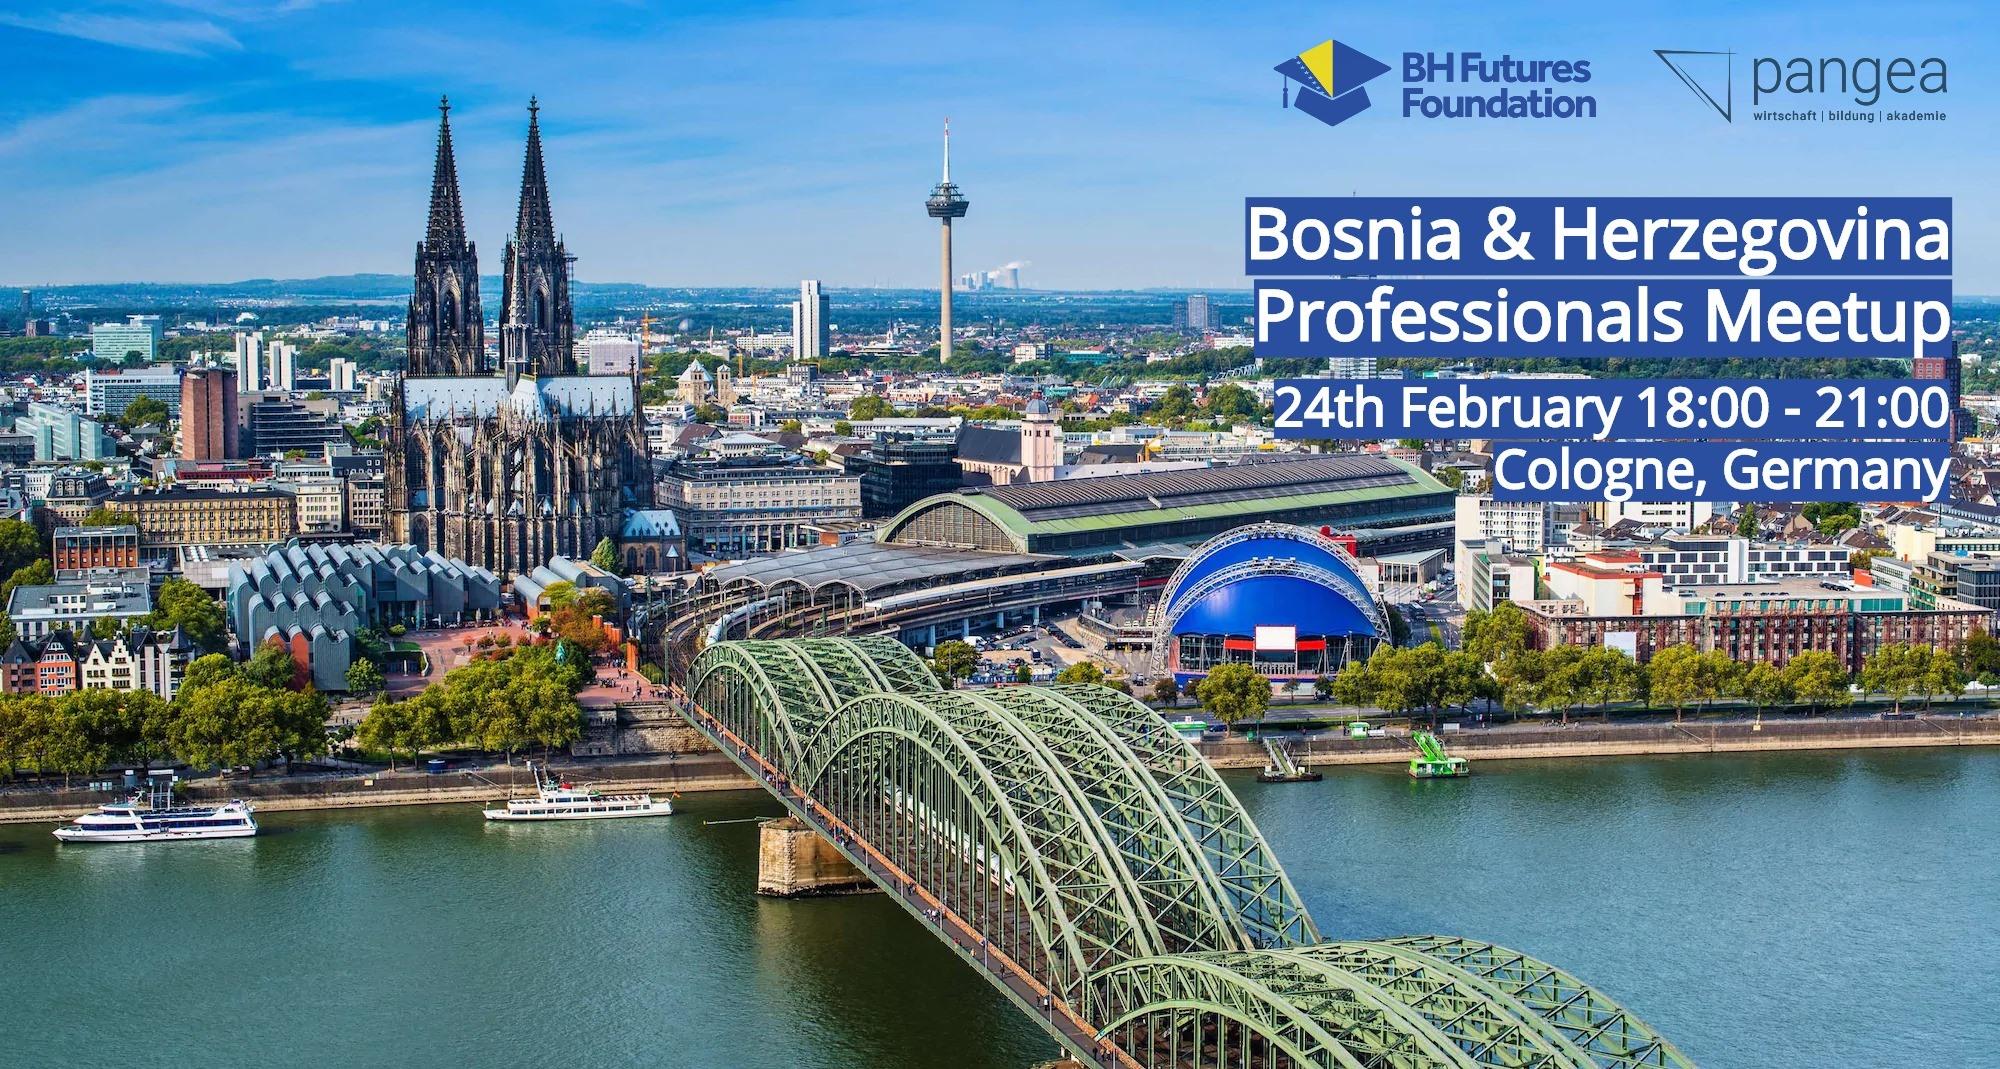 pangea | @professionals meetup mit Bosnia & Herzegovina Futures Foundation, Köln